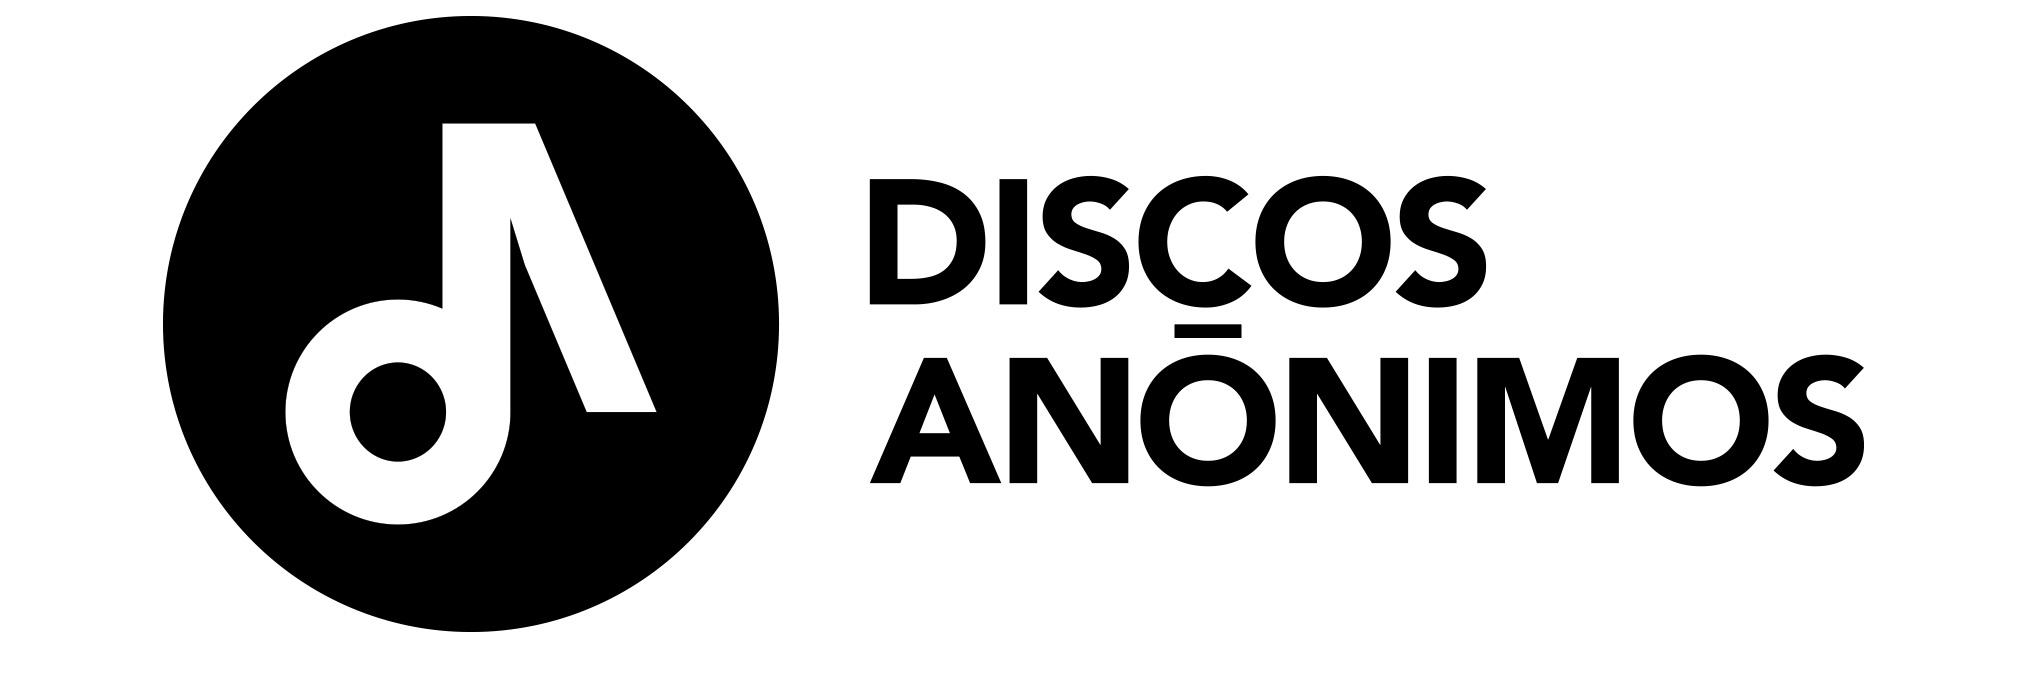 discos_anonimos_logo.jpg